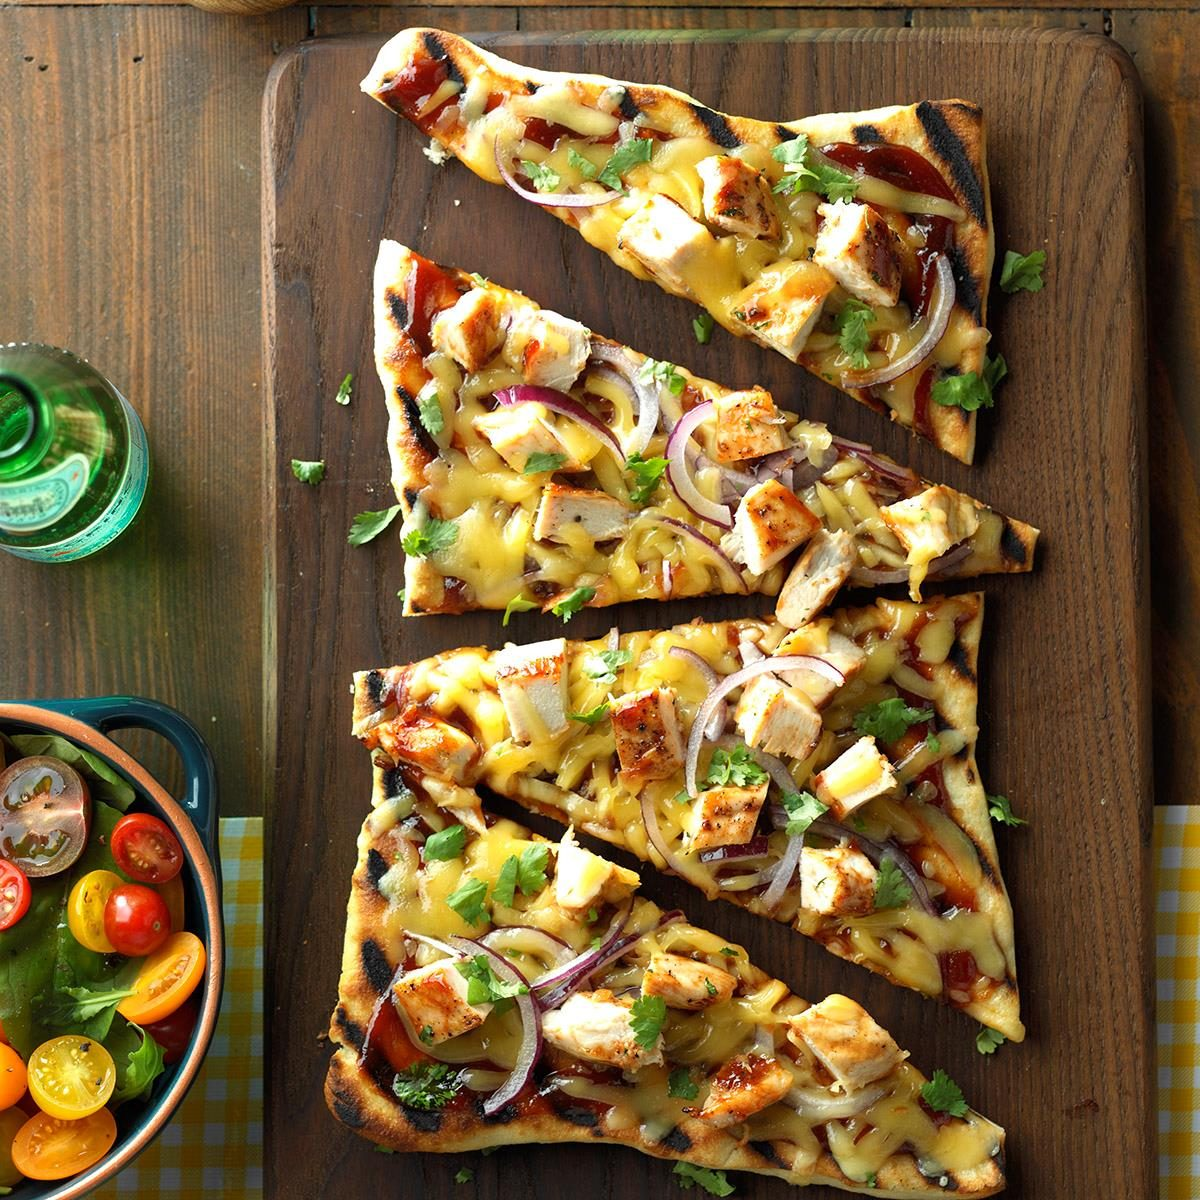 California Kitchen Pizza Menu: 29 California Pizza Kitchen Copycat Recipes To Make At